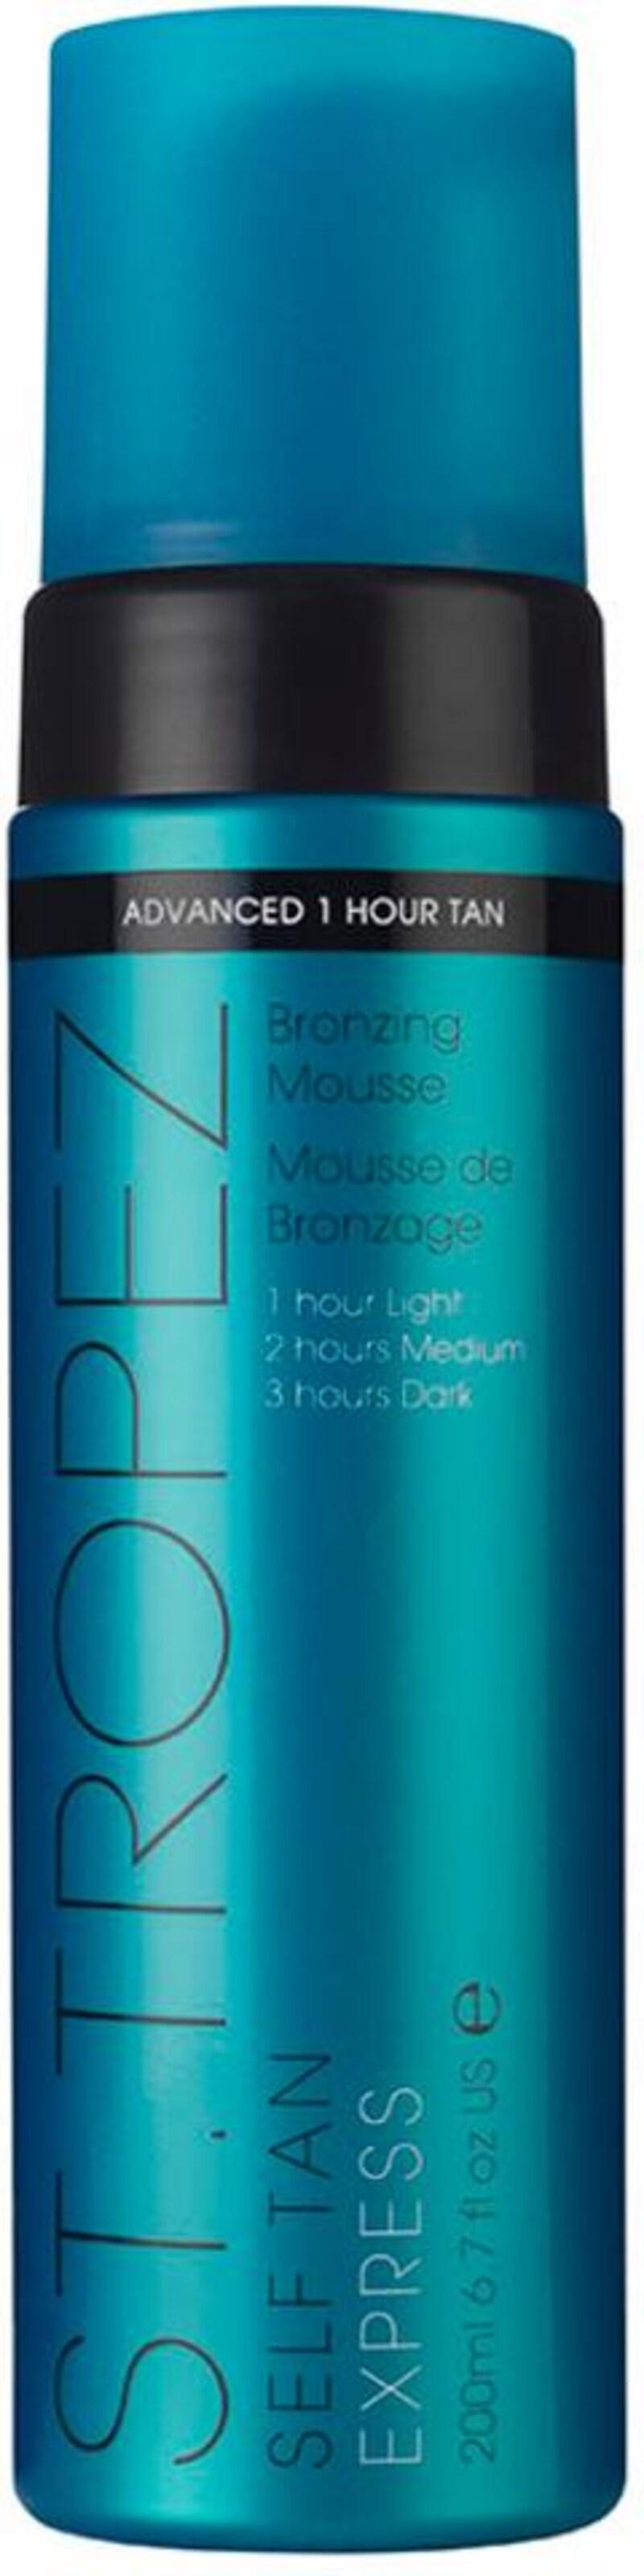 St.Tropez 'Self Tan Express Bronzing Mousse', Selbstbräuner